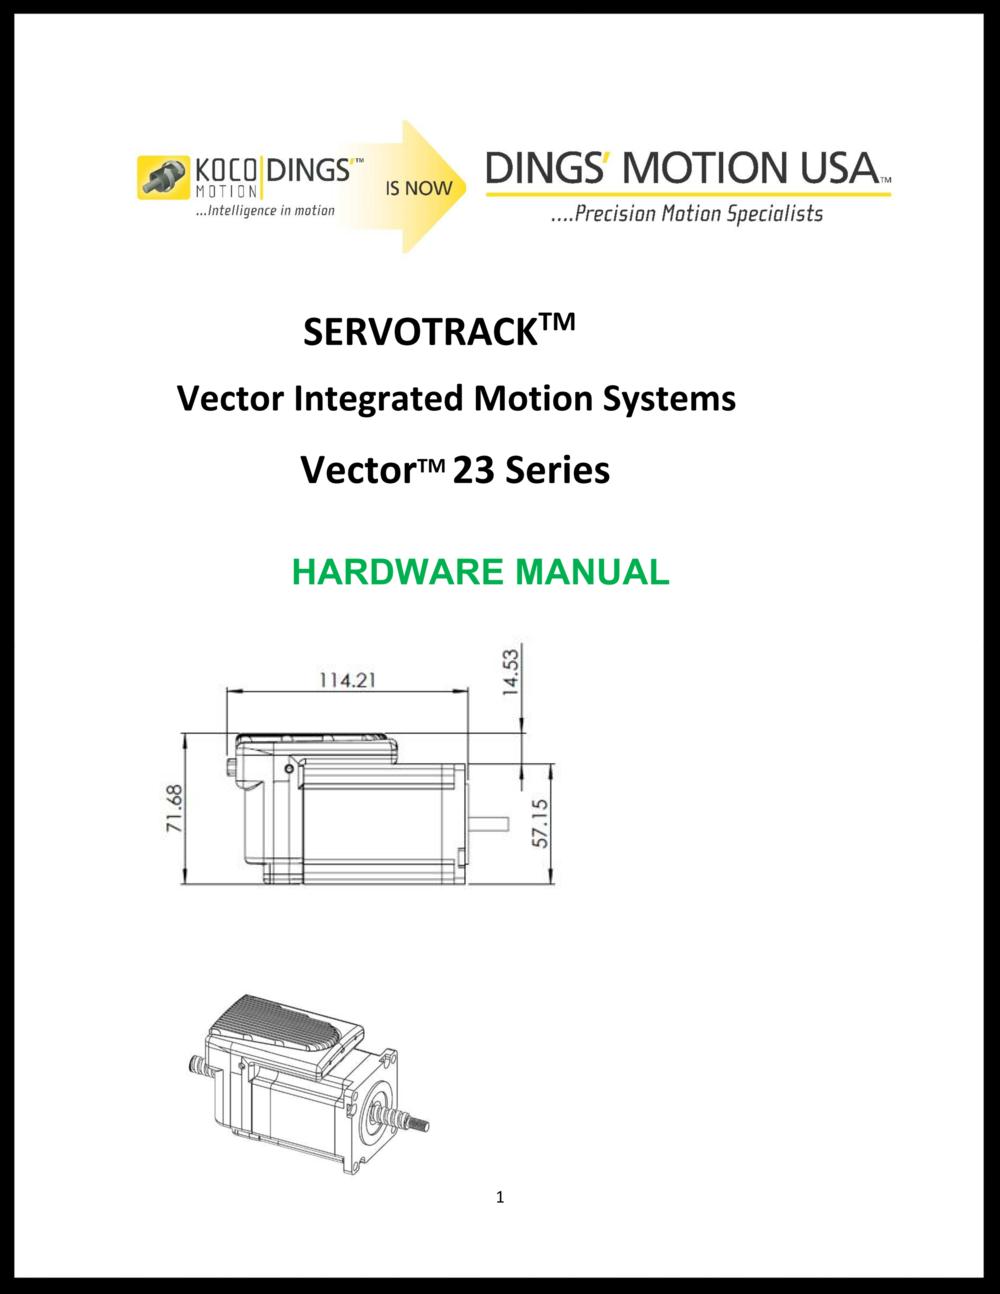 Vector Hardware Manual